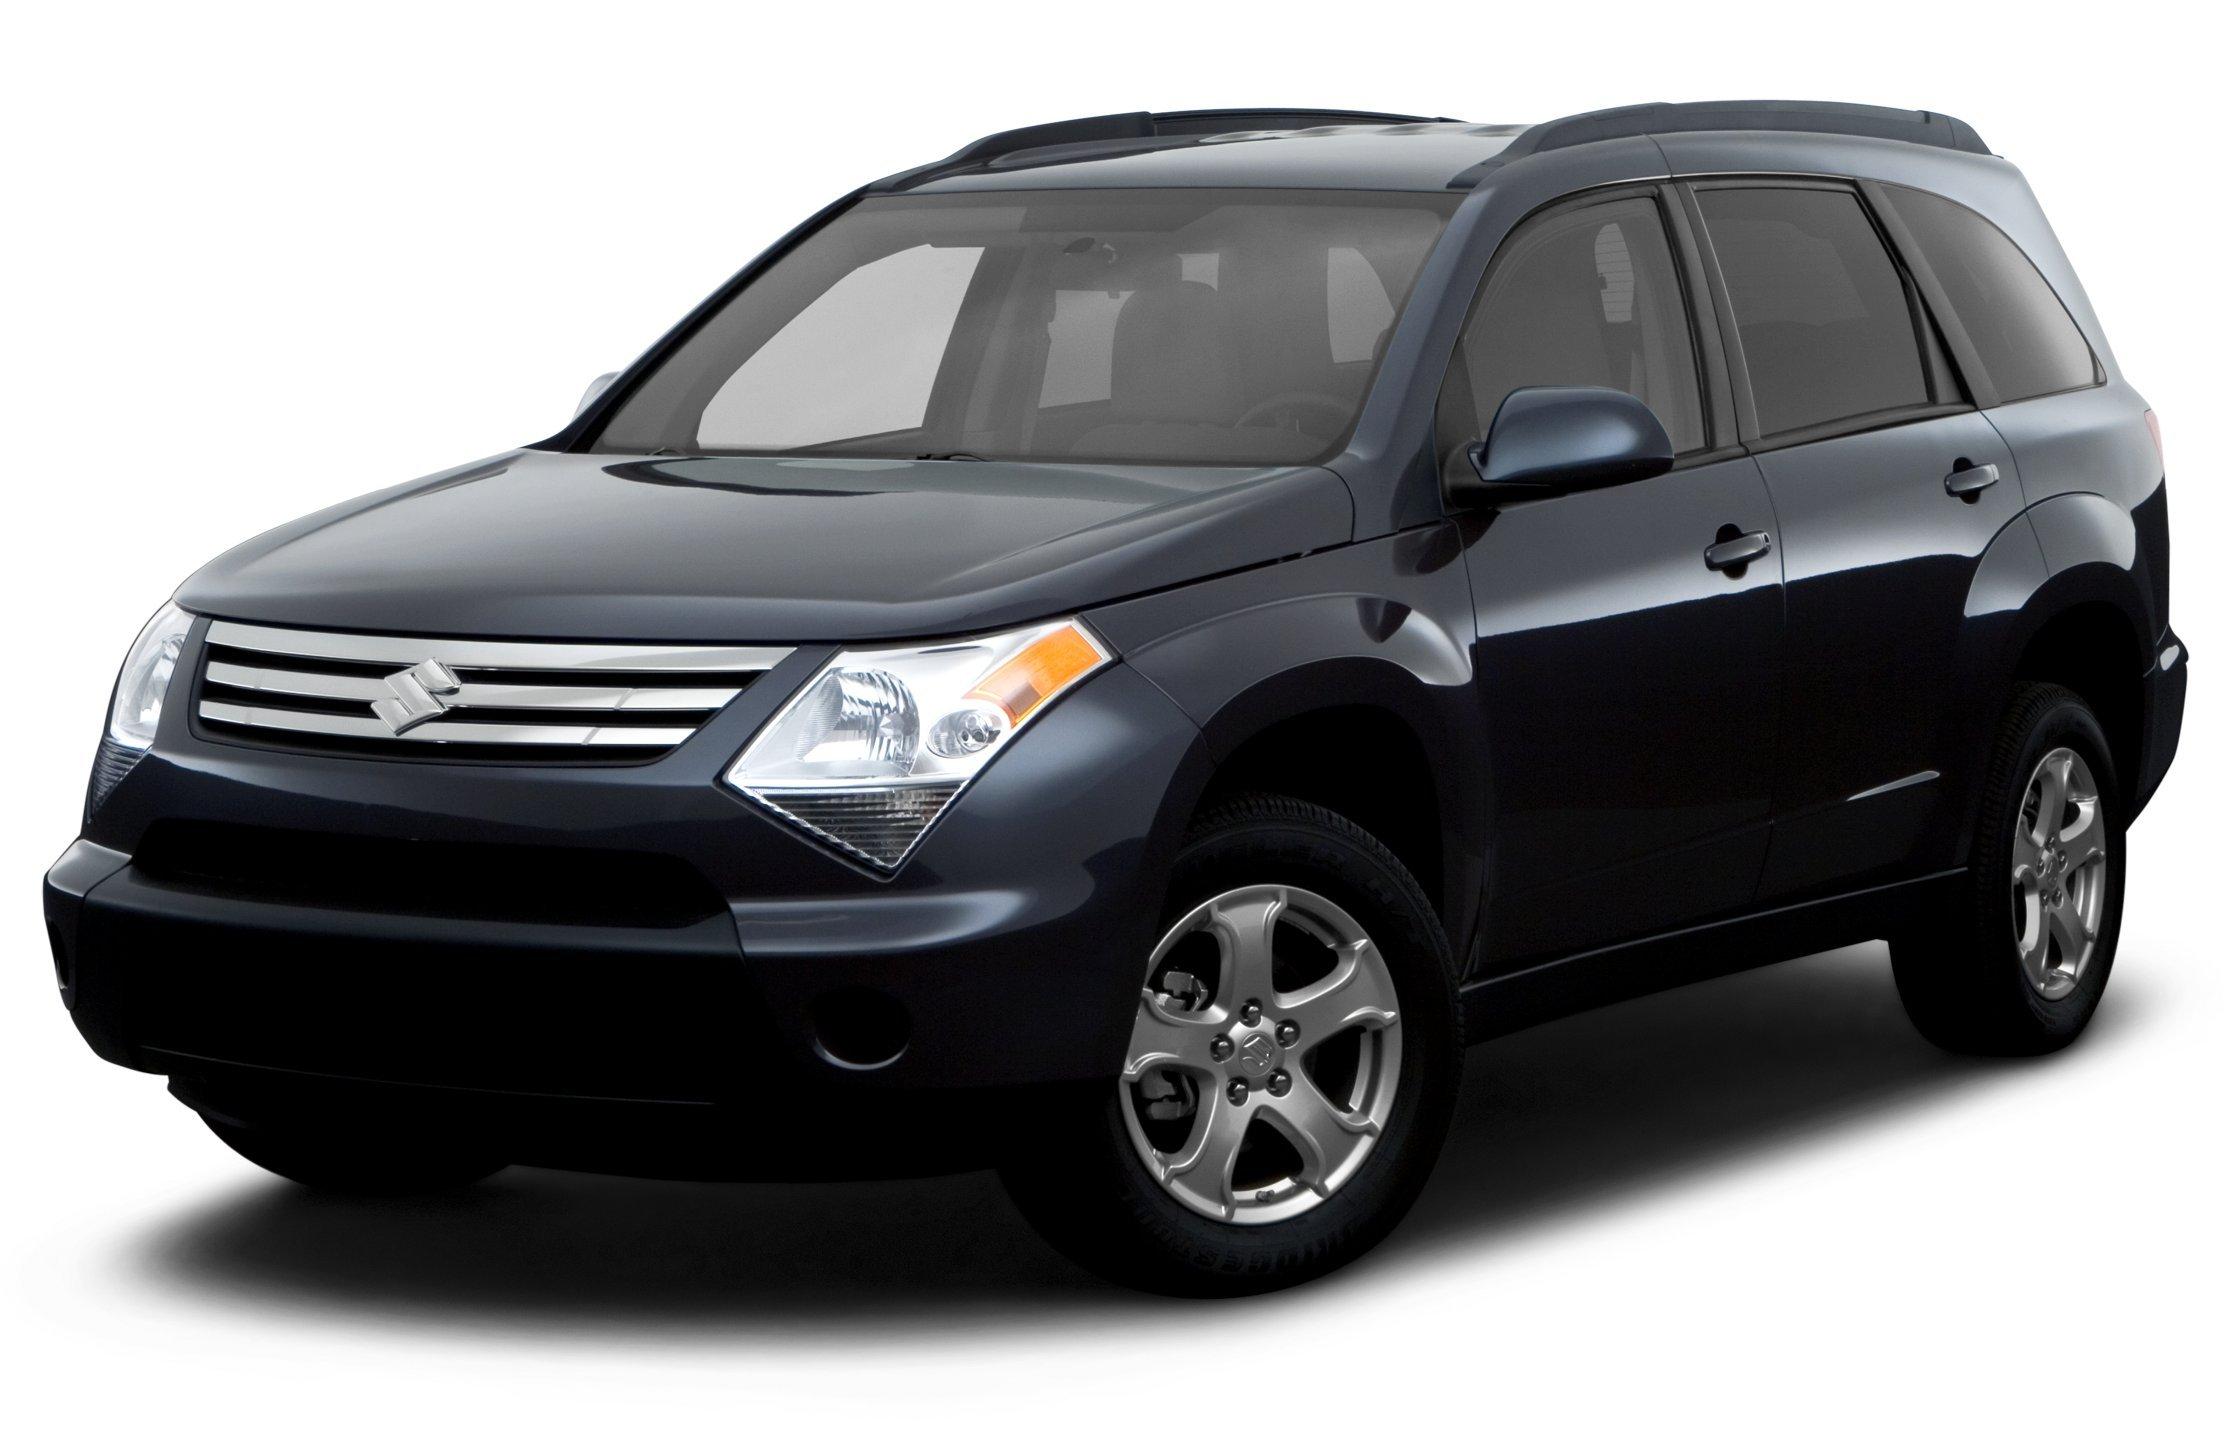 ... 2008 Suzuki XL-7 Special Edition, All Wheel Drive 4-Door ...